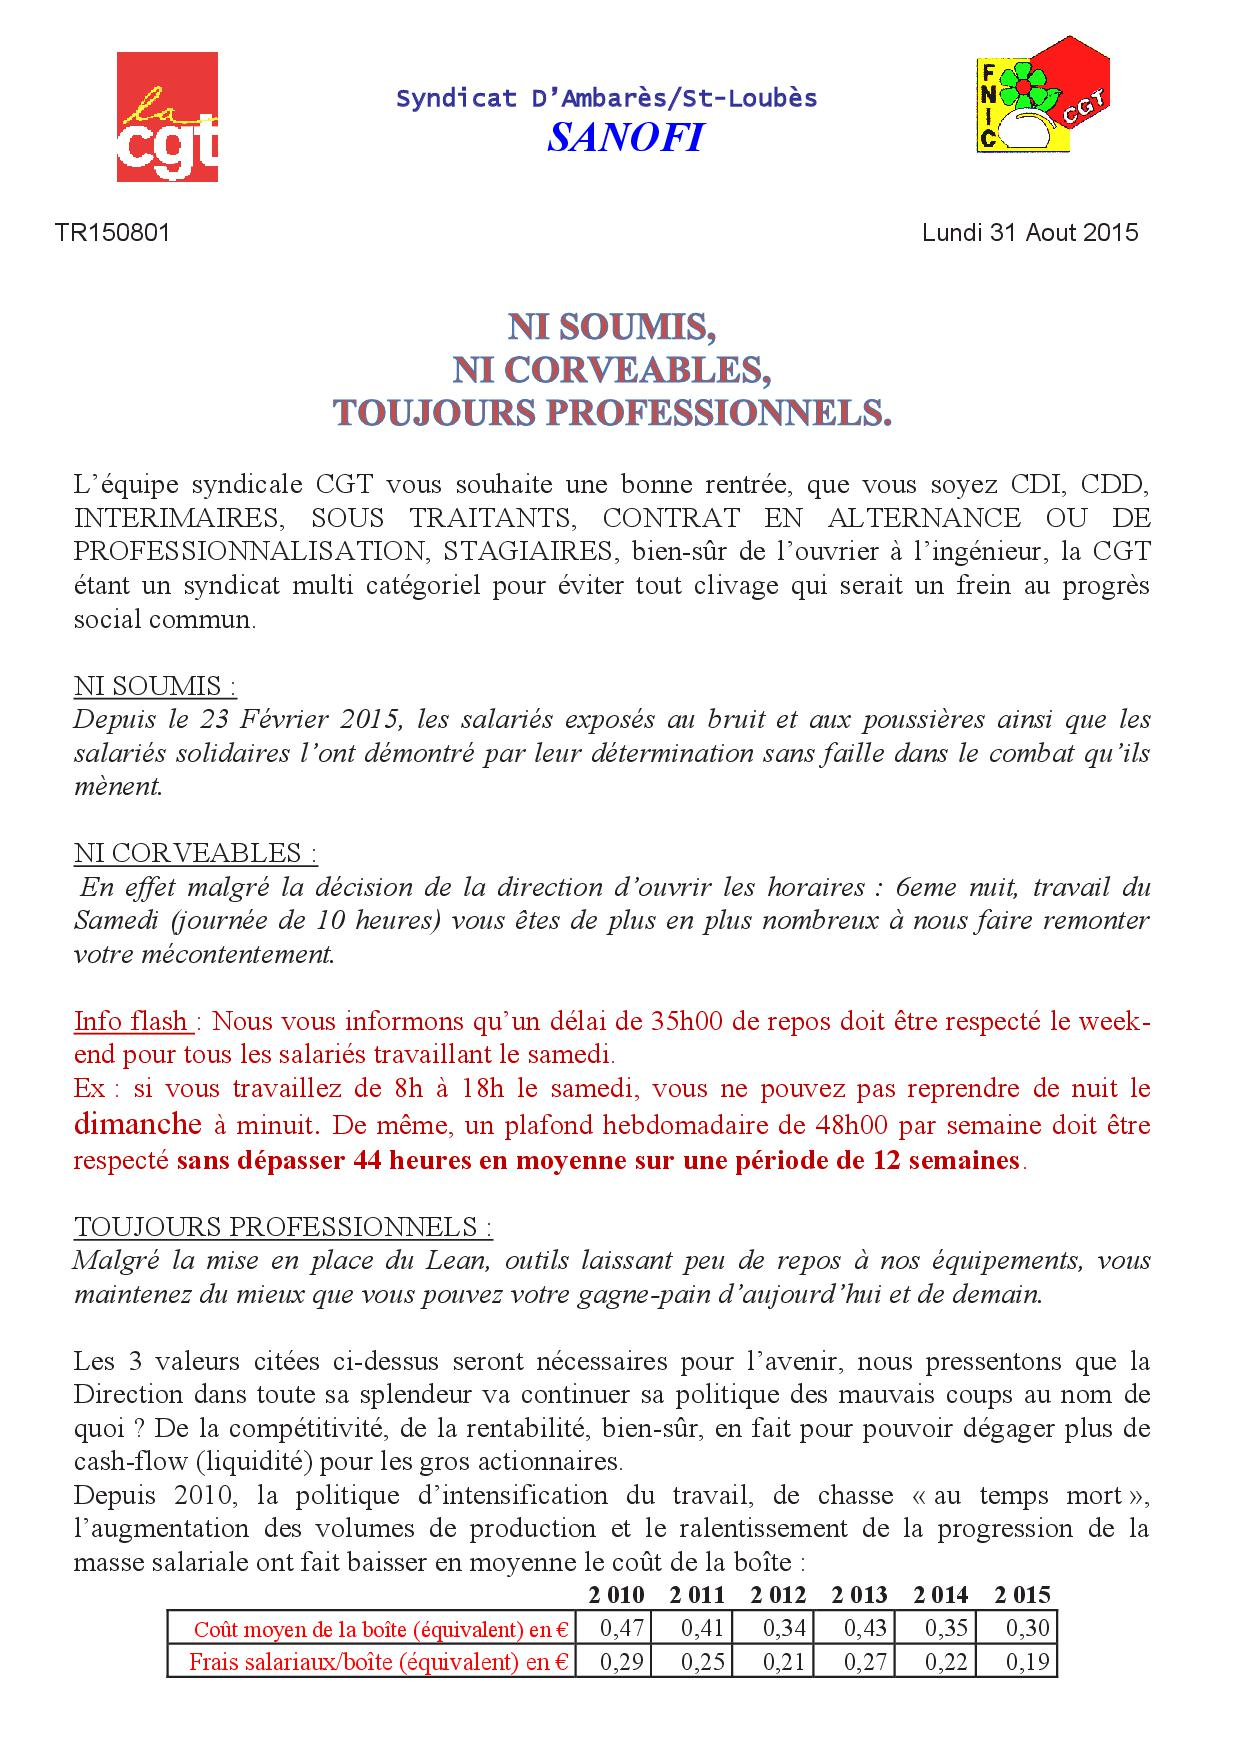 TR150801 grève du lundi 31 Aout 2015